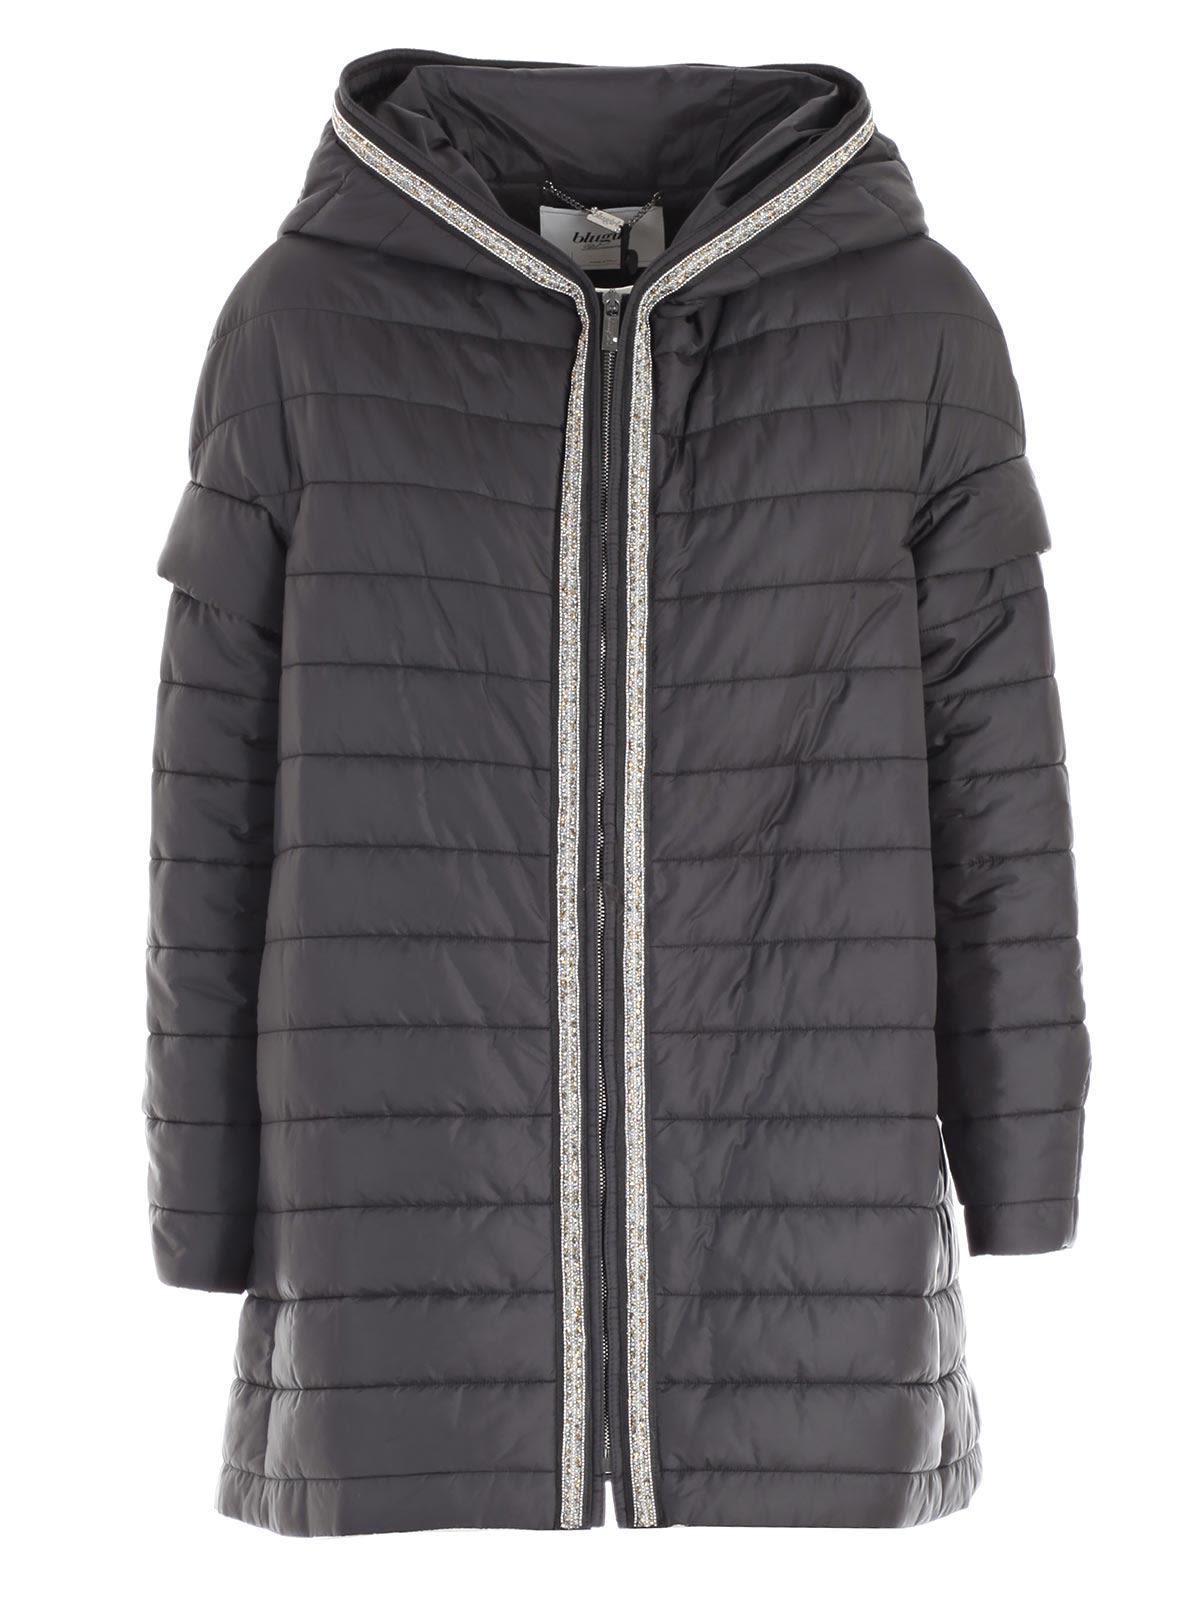 Blugirl Coat In Black